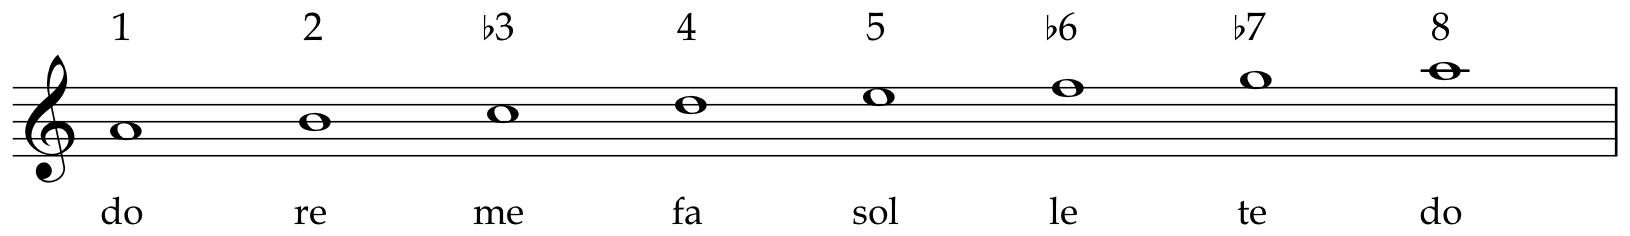 Mode - Musicianship and Theory IV (MUS:2204), Spring 2018 - UIowa Wiki